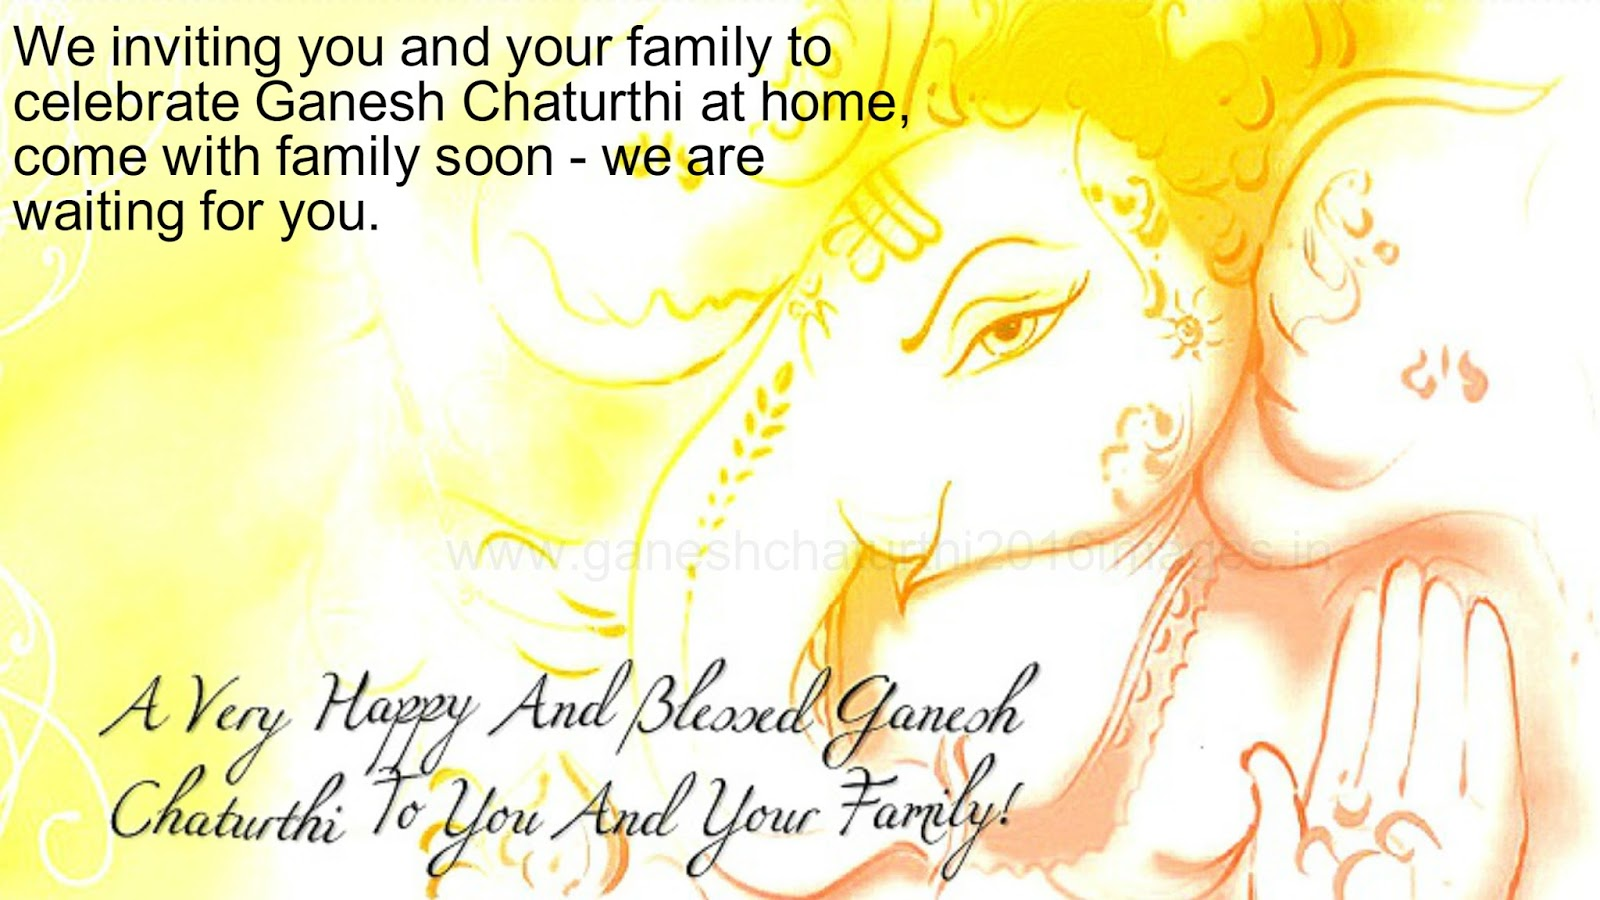 Ganesh puja invitation card 2017 all the best invitation in 2018 invitation letter format for ganesh puja newsinvitation co stopboris Images